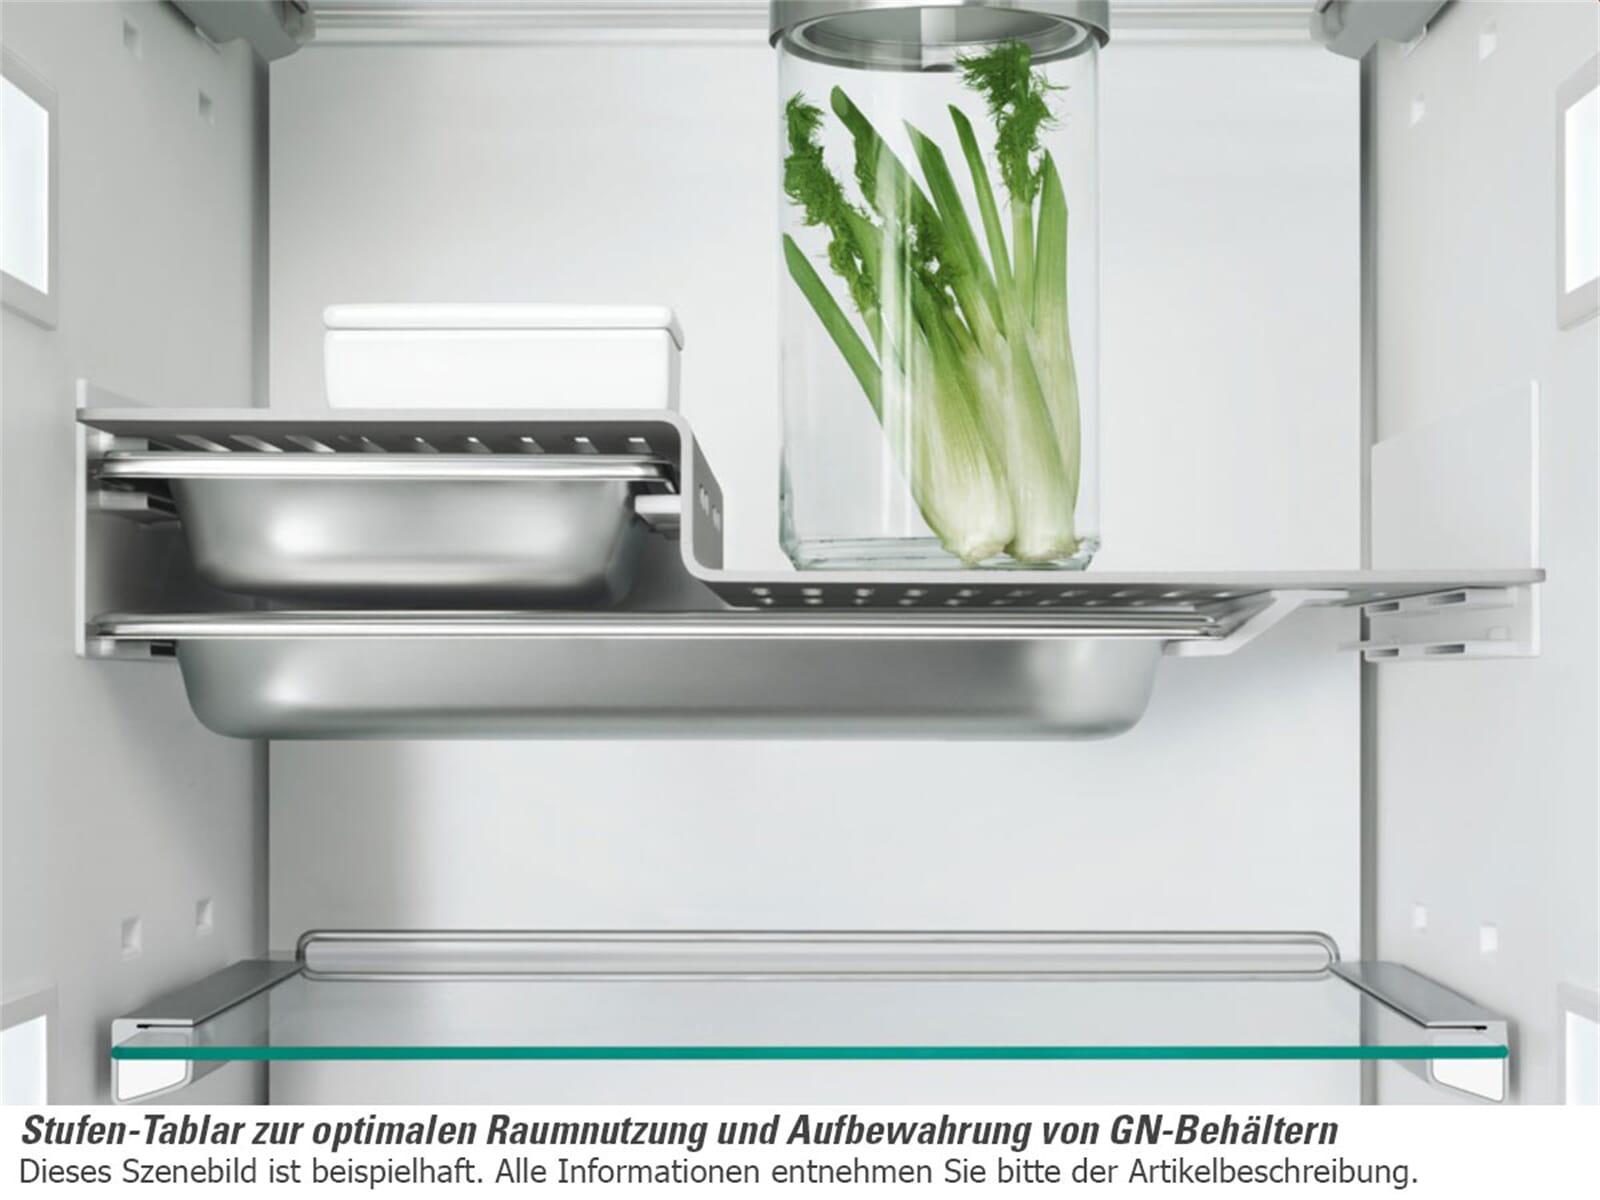 Gaggenau RB 287 203 Serie 200 Einbau-Kühl-Gefrierkombination